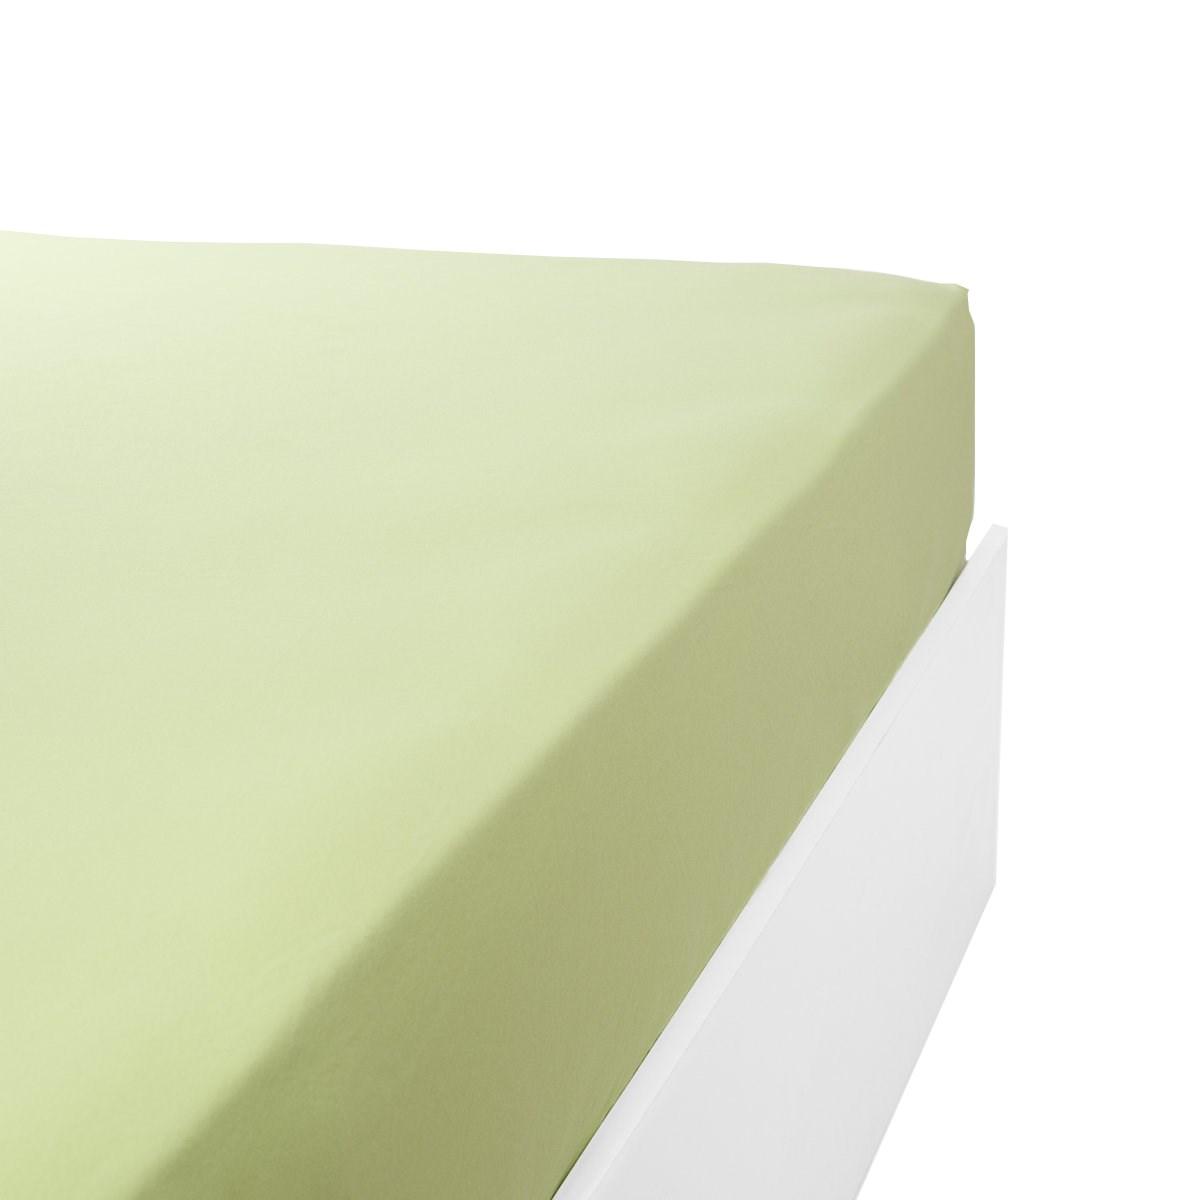 Drap housse flanelle en Molleton Vert anis 120x200 cm